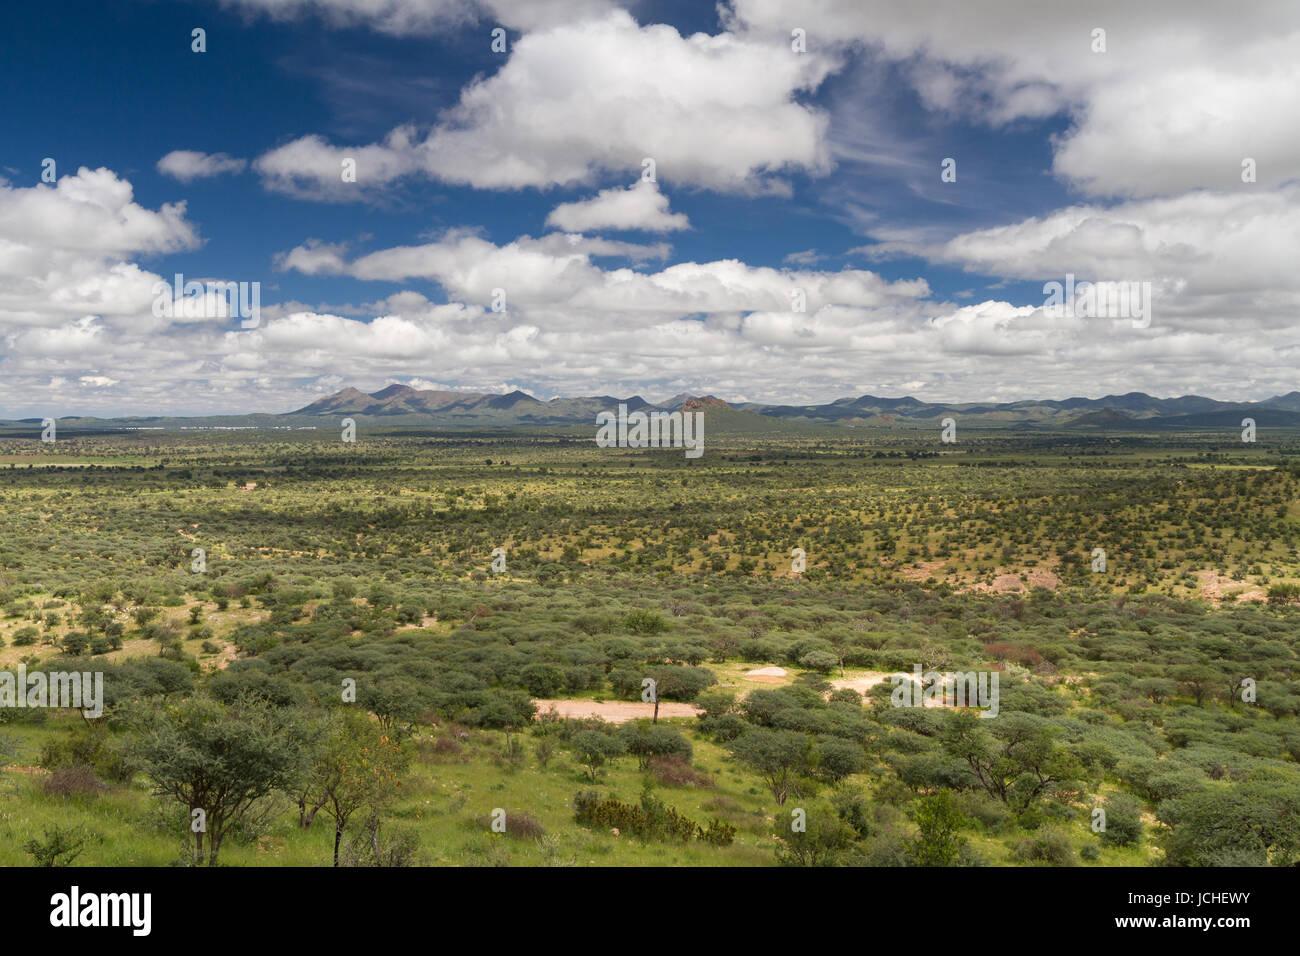 Namibian grassland in the rain season near Windhoek, Namibia, Africa - Stock Image